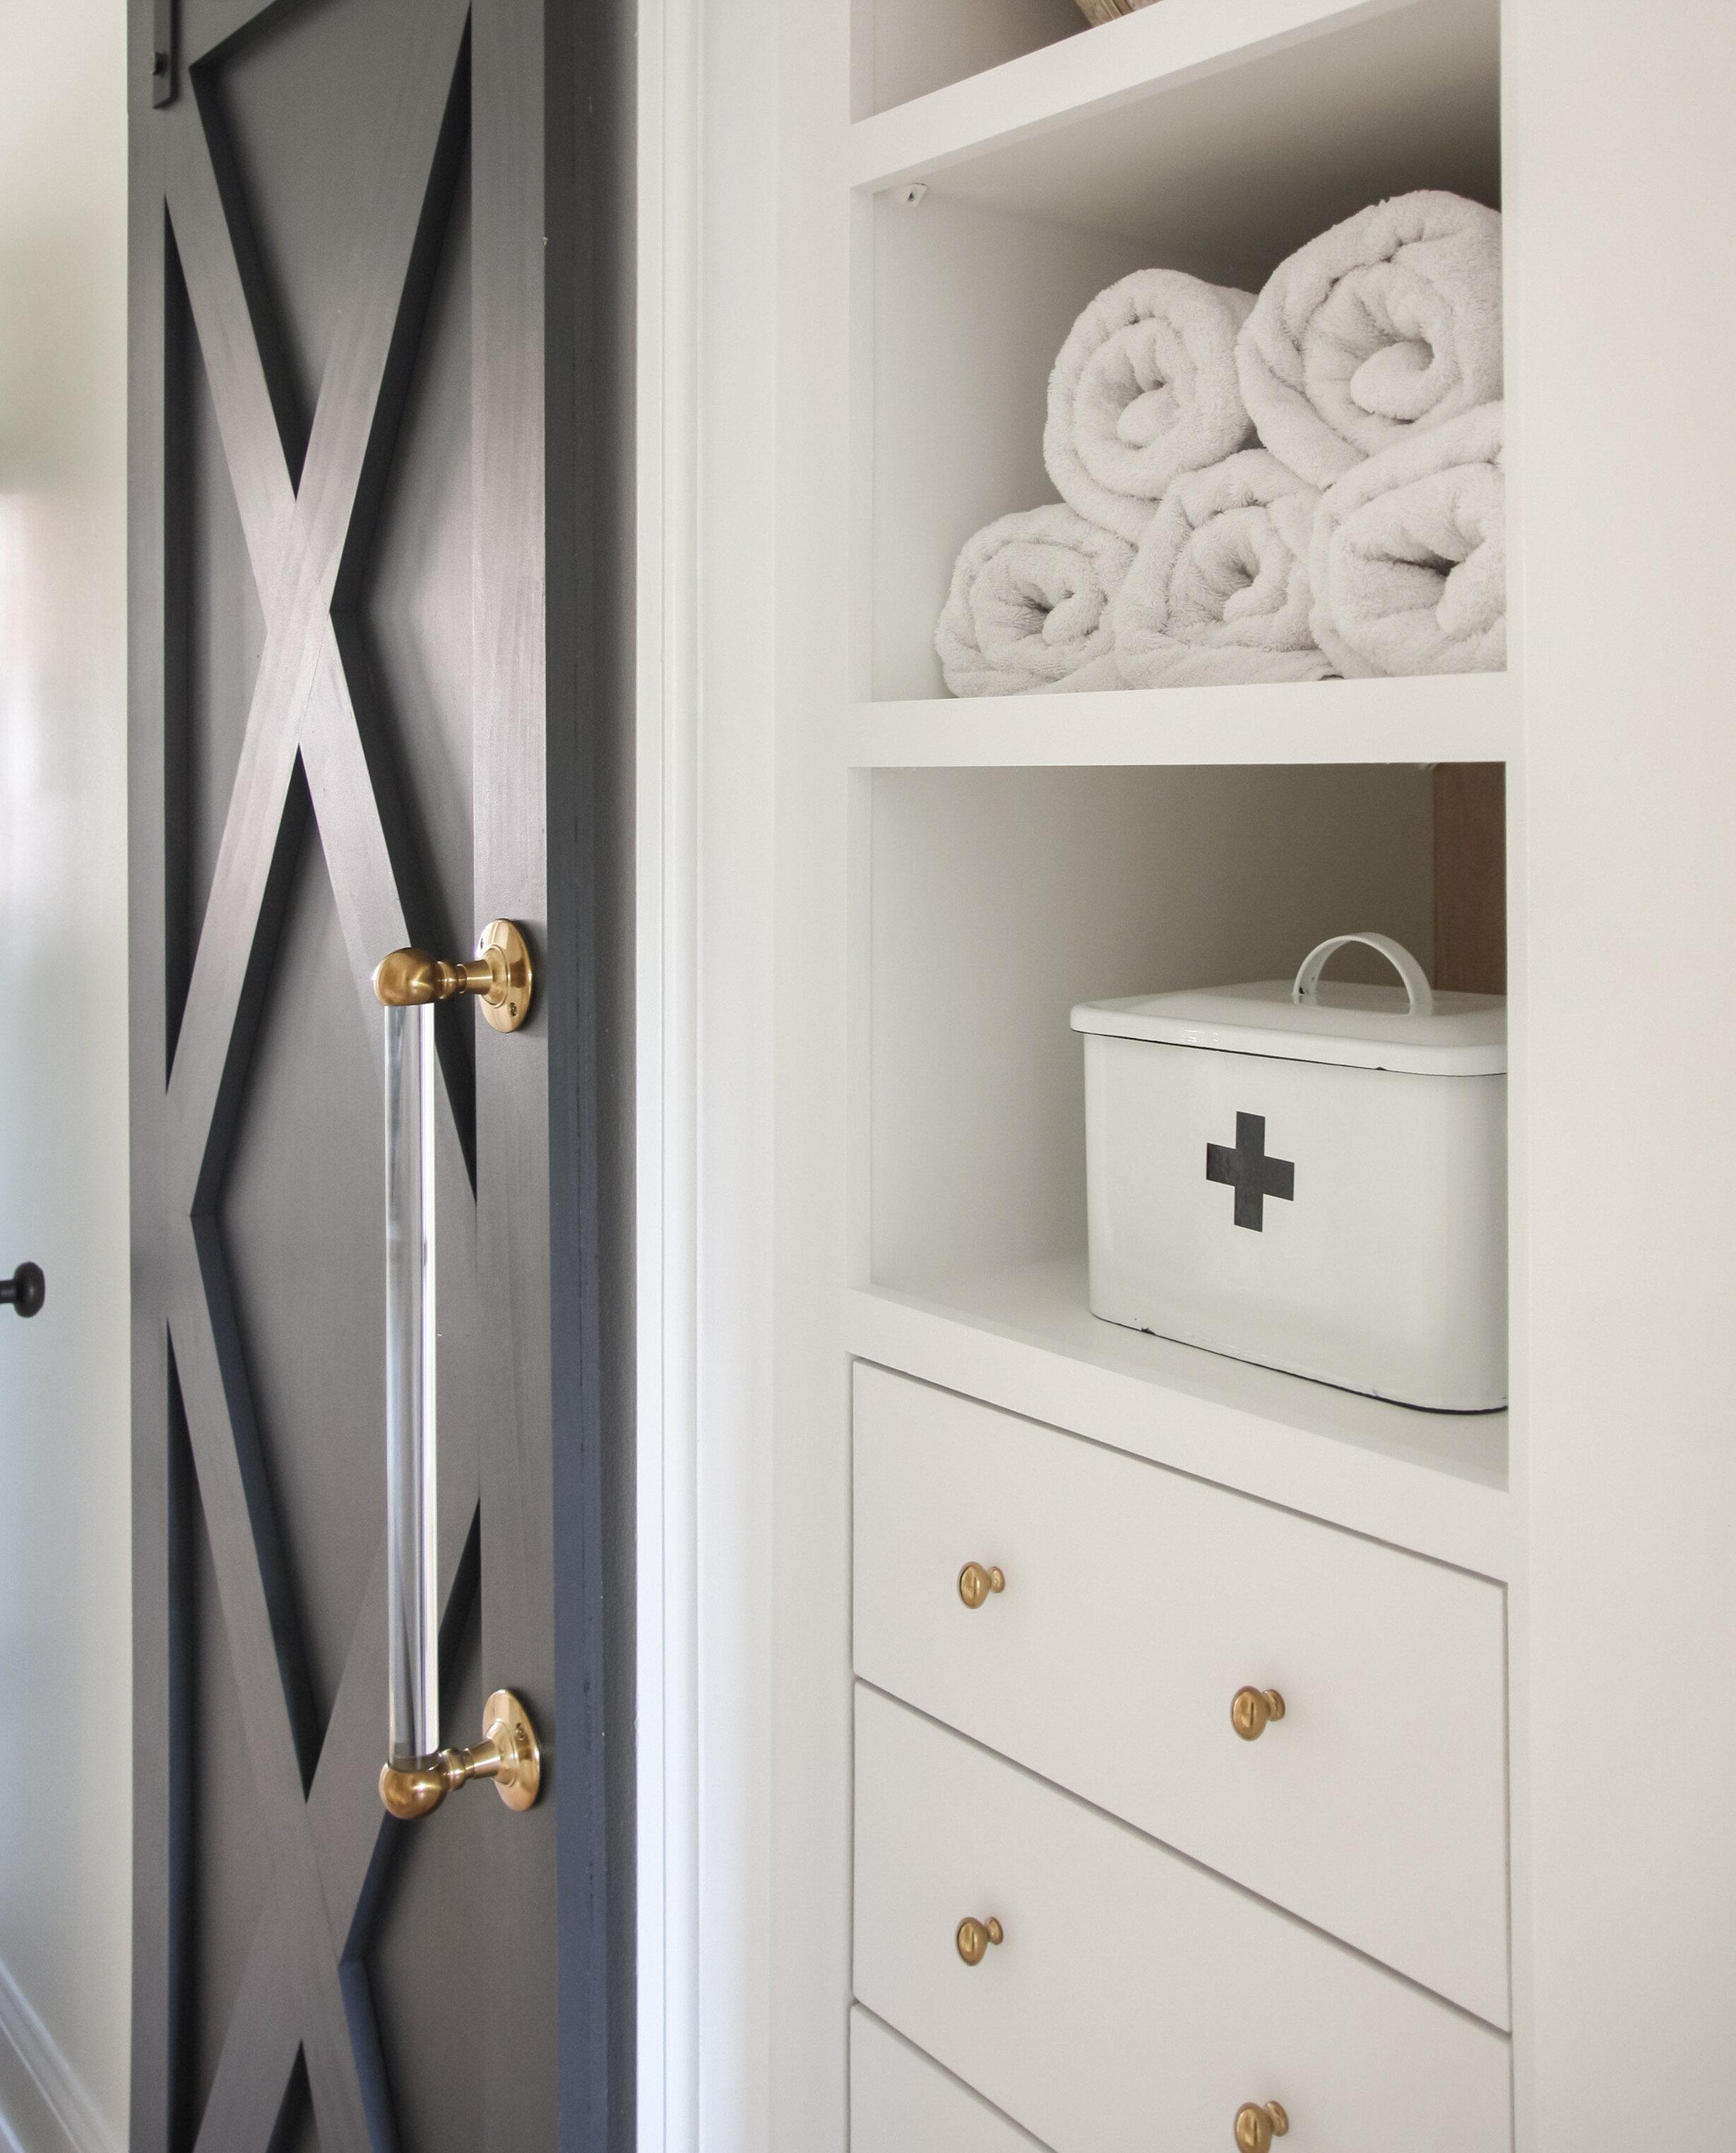 IKEA Pax Hack Linen Closet Reveal — Blushing Boho